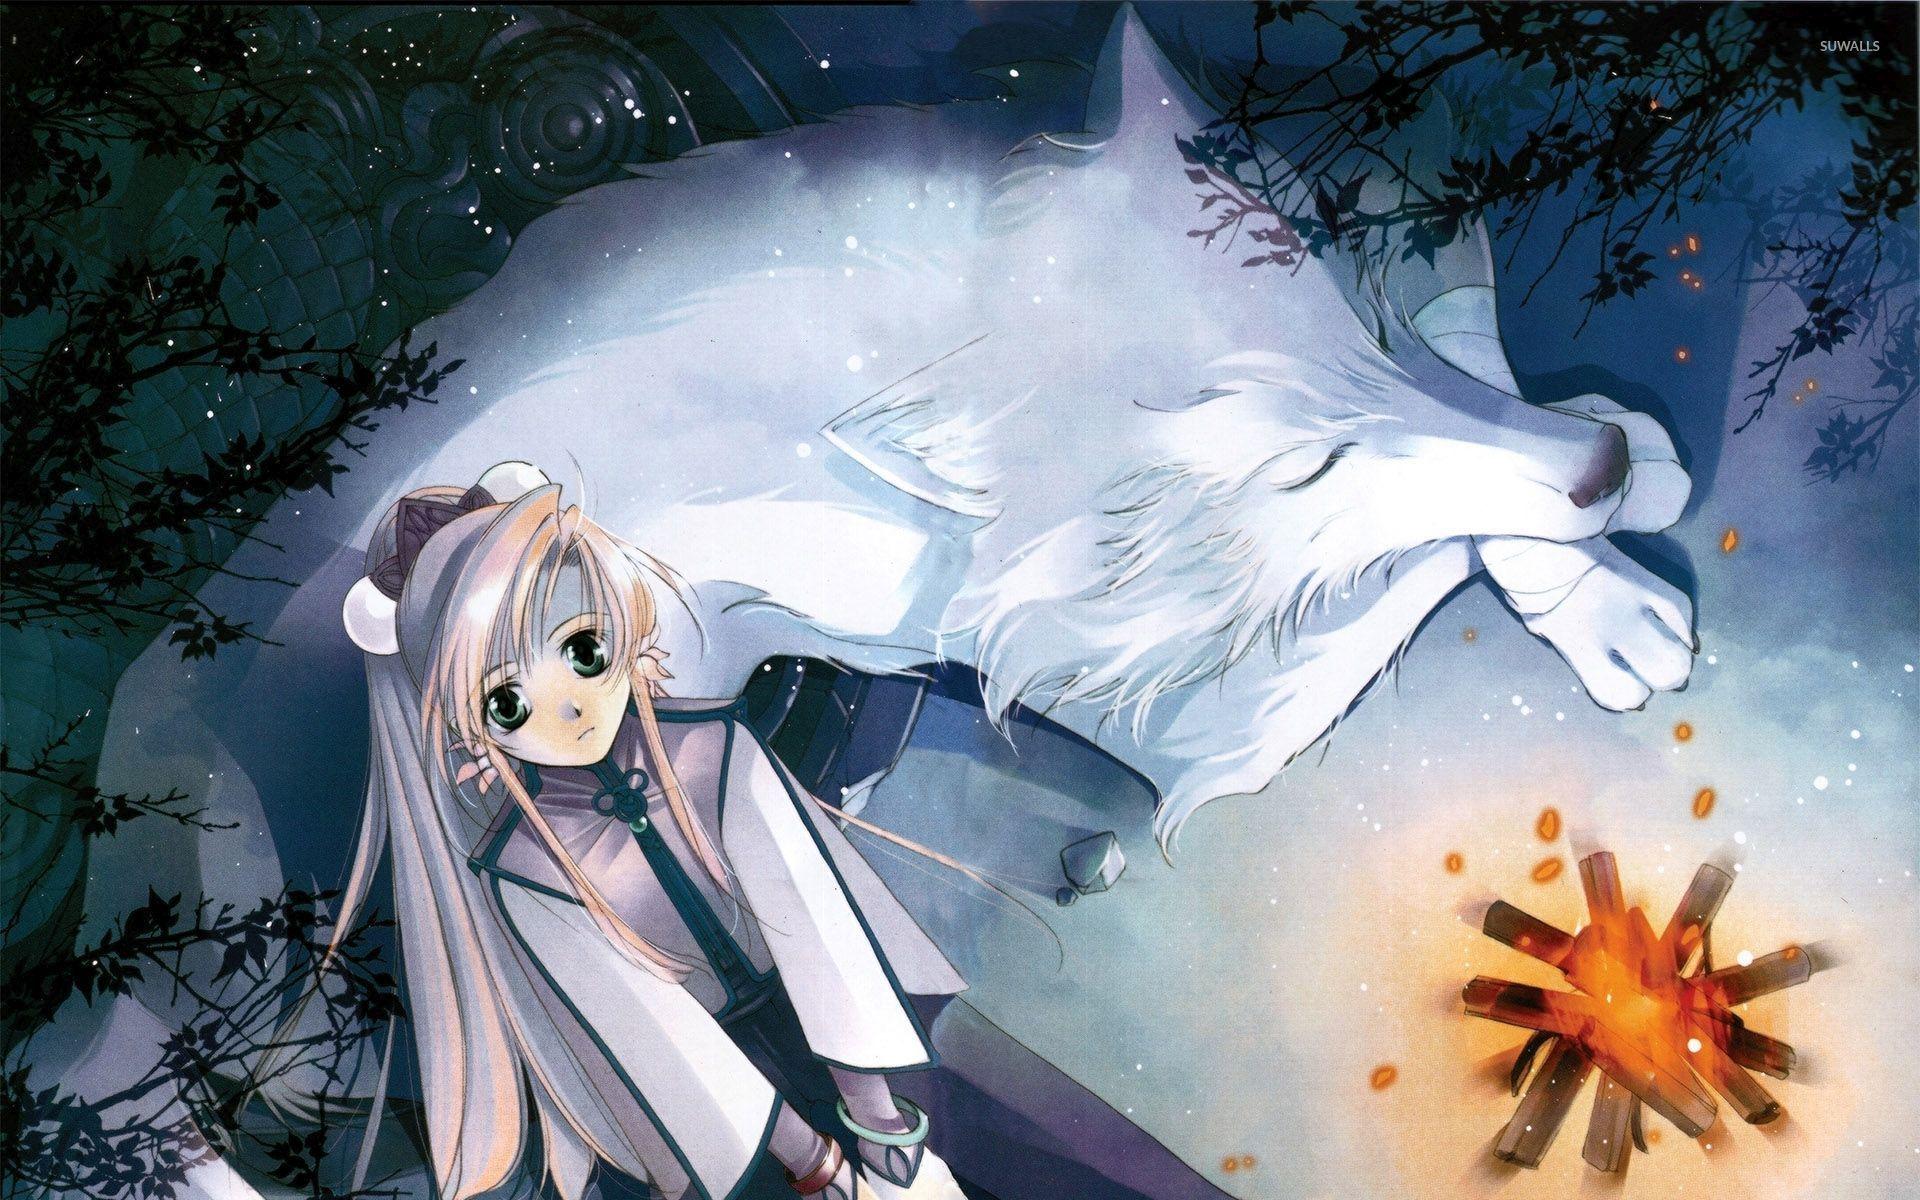 kiba wolf 39 s rain wallpaper anime wallpapers 32747